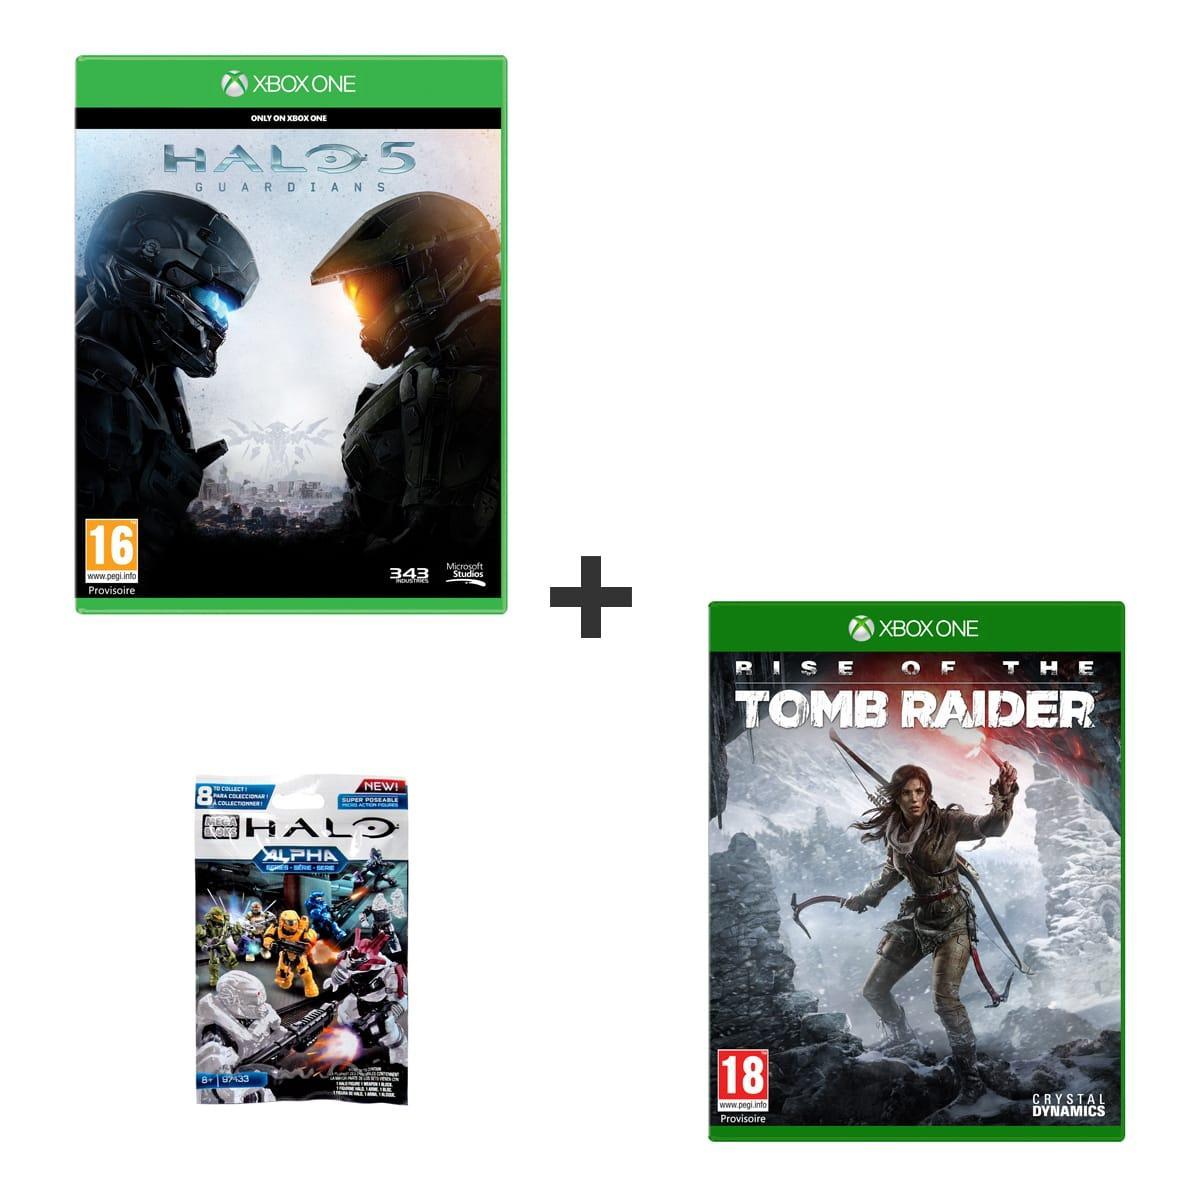 Halo 5 + Tomb Raider + Figurine sur Xbox One